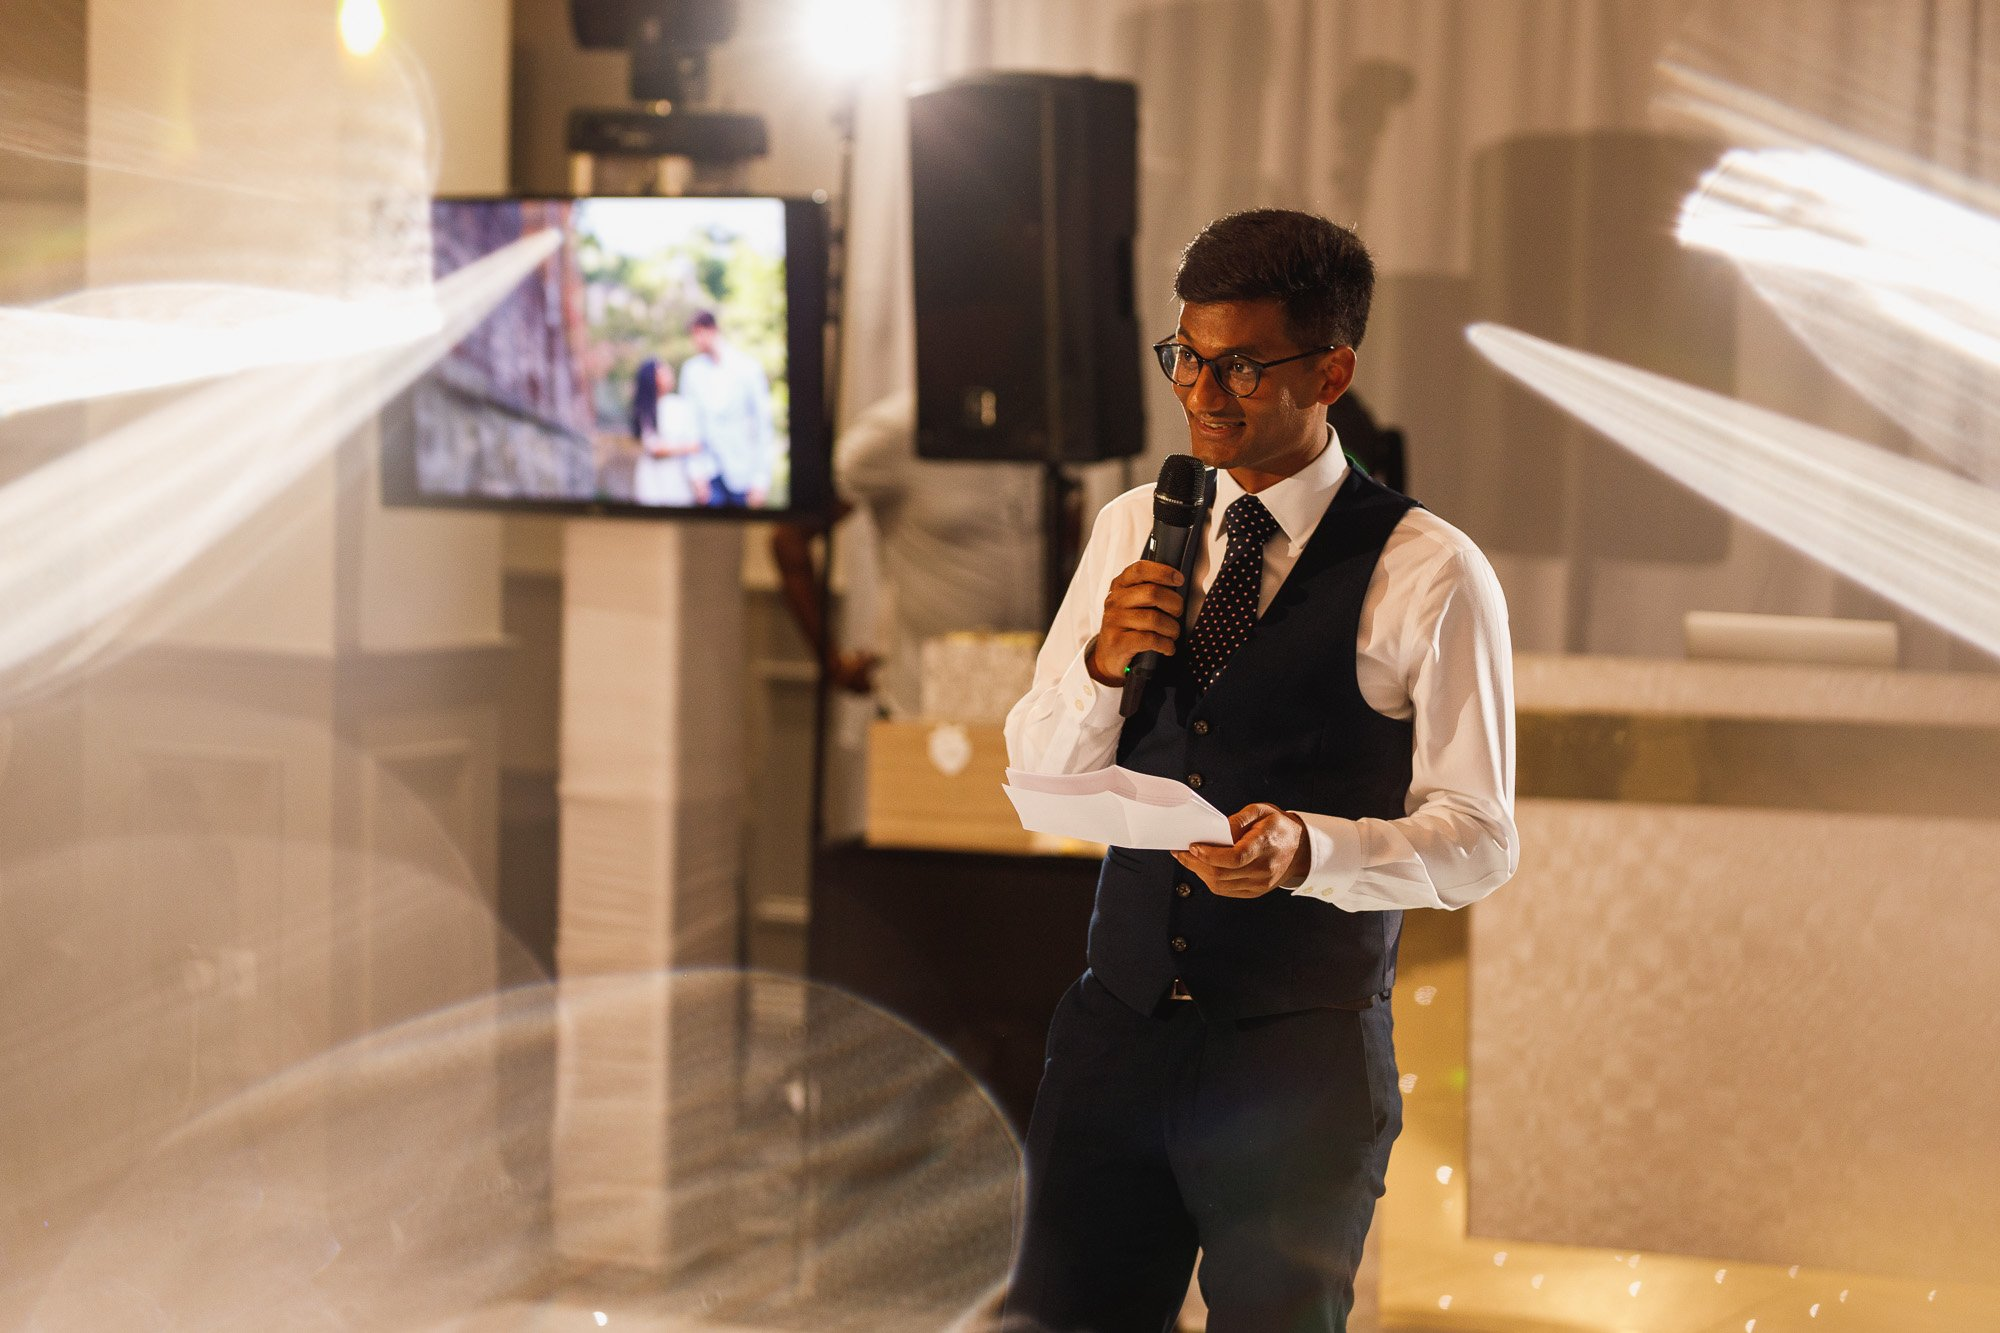 De Vere Wokefield Estate, Asian wedding photographer, reception, speeches